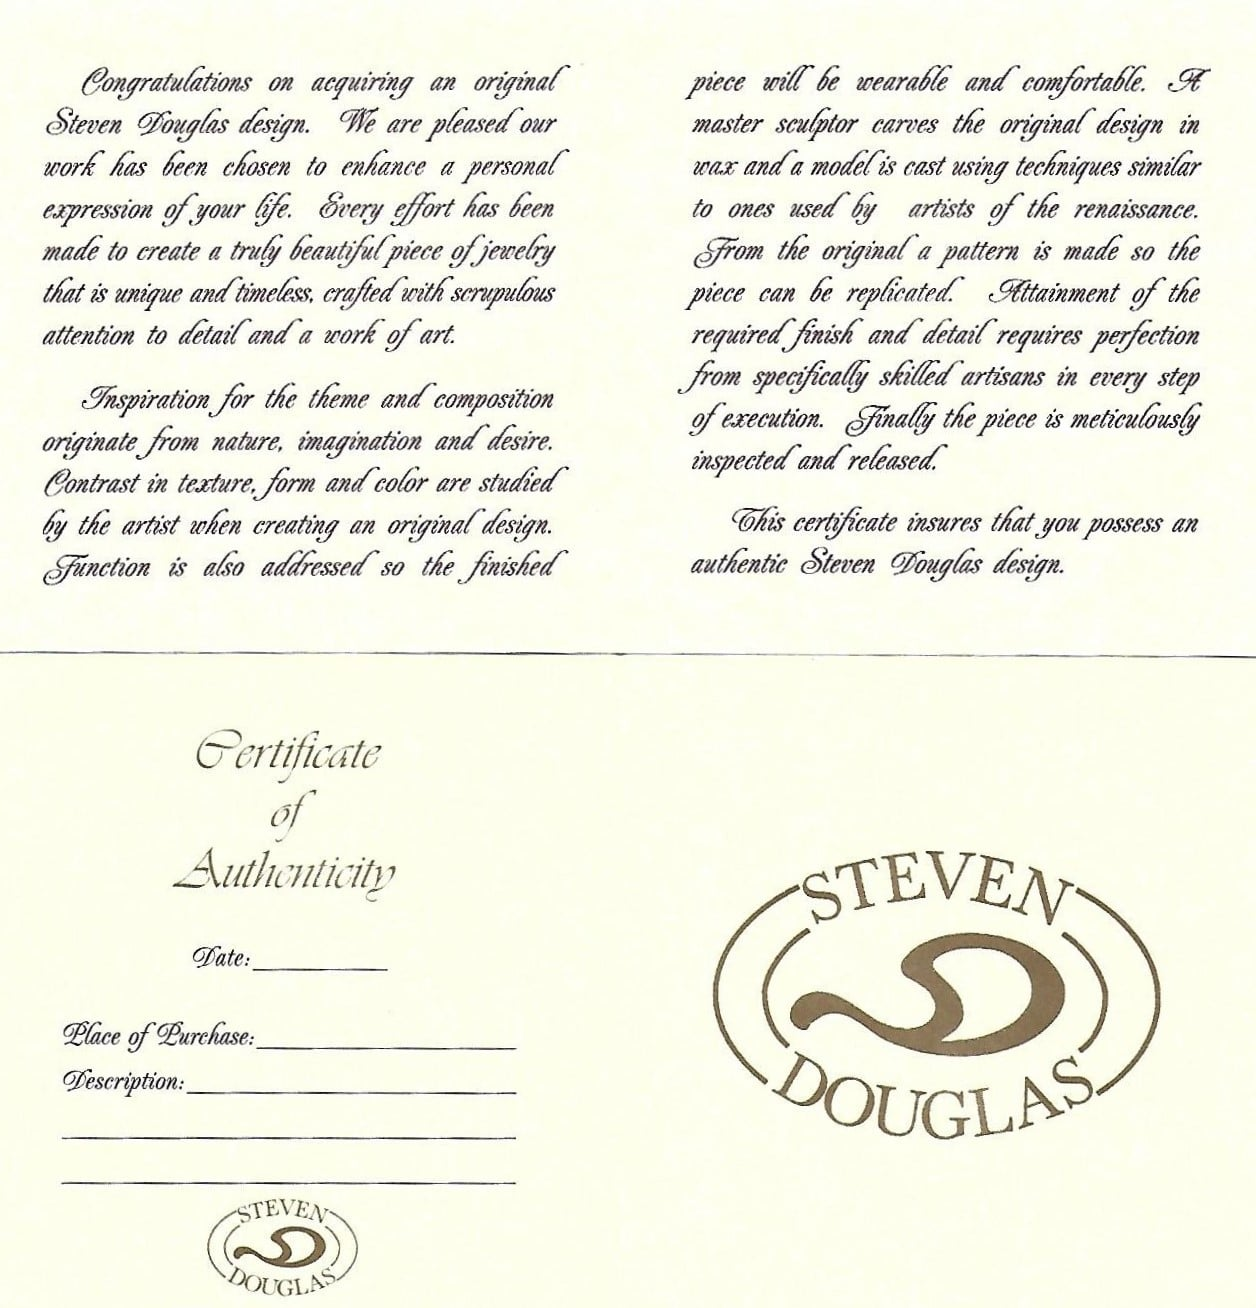 Steven Douglas Seahorse Bangle Bracelet,Sterling Silver/14K